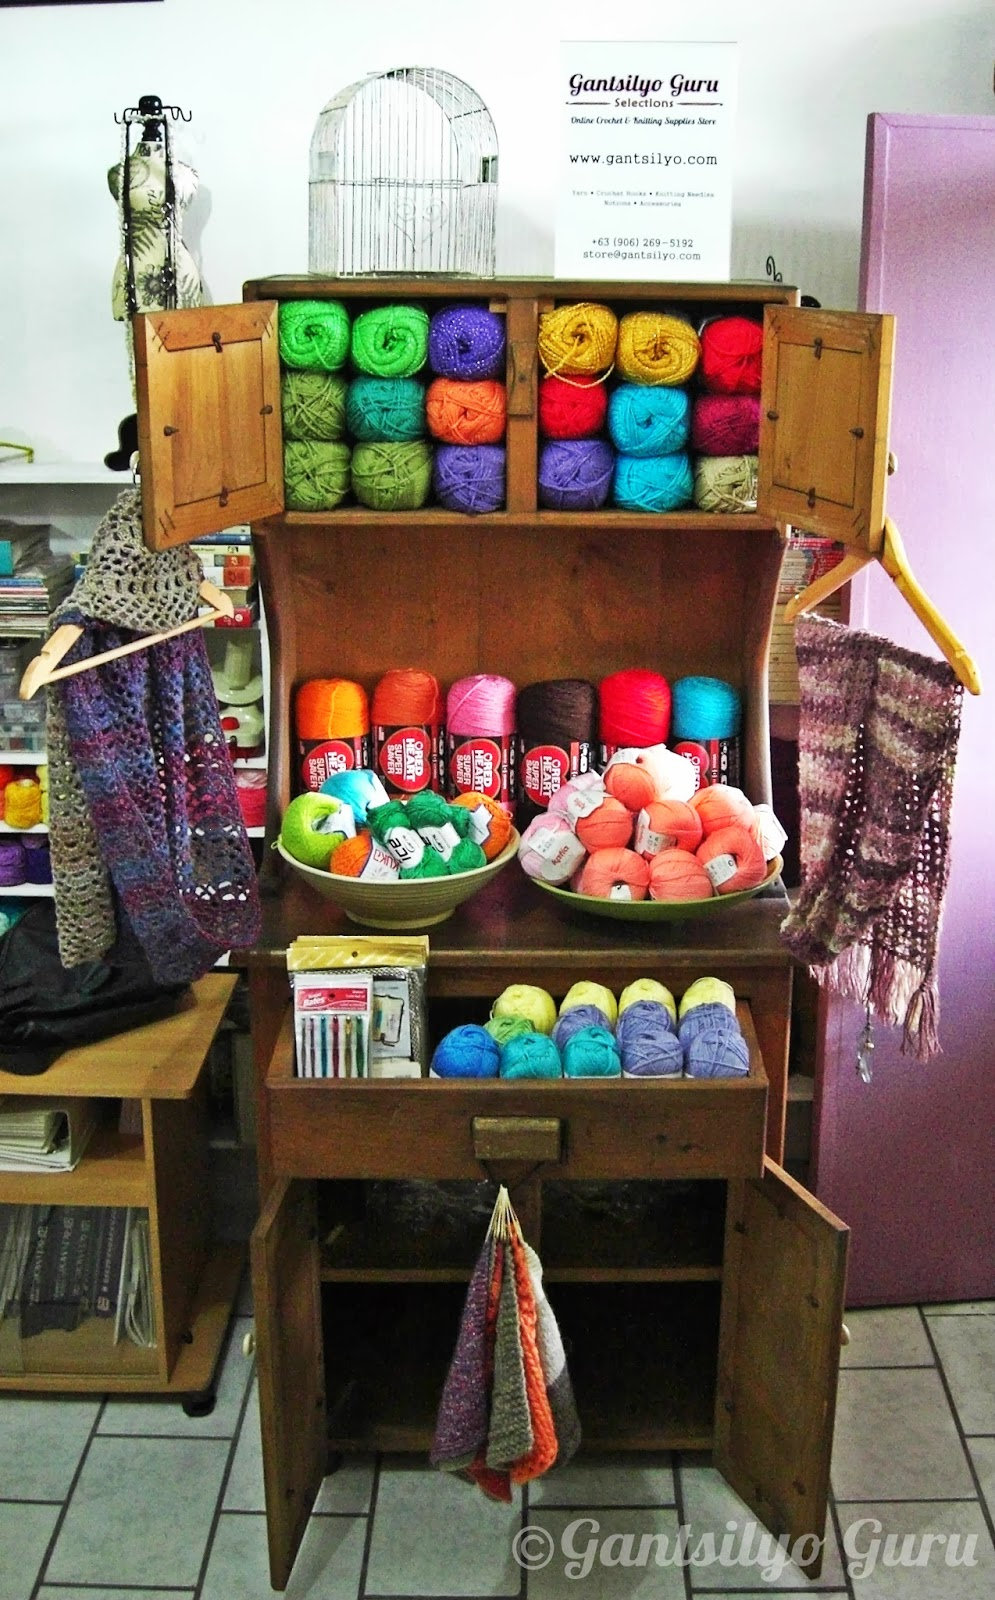 Gantsilyo Guru: The Traveling Yarn Cabinet